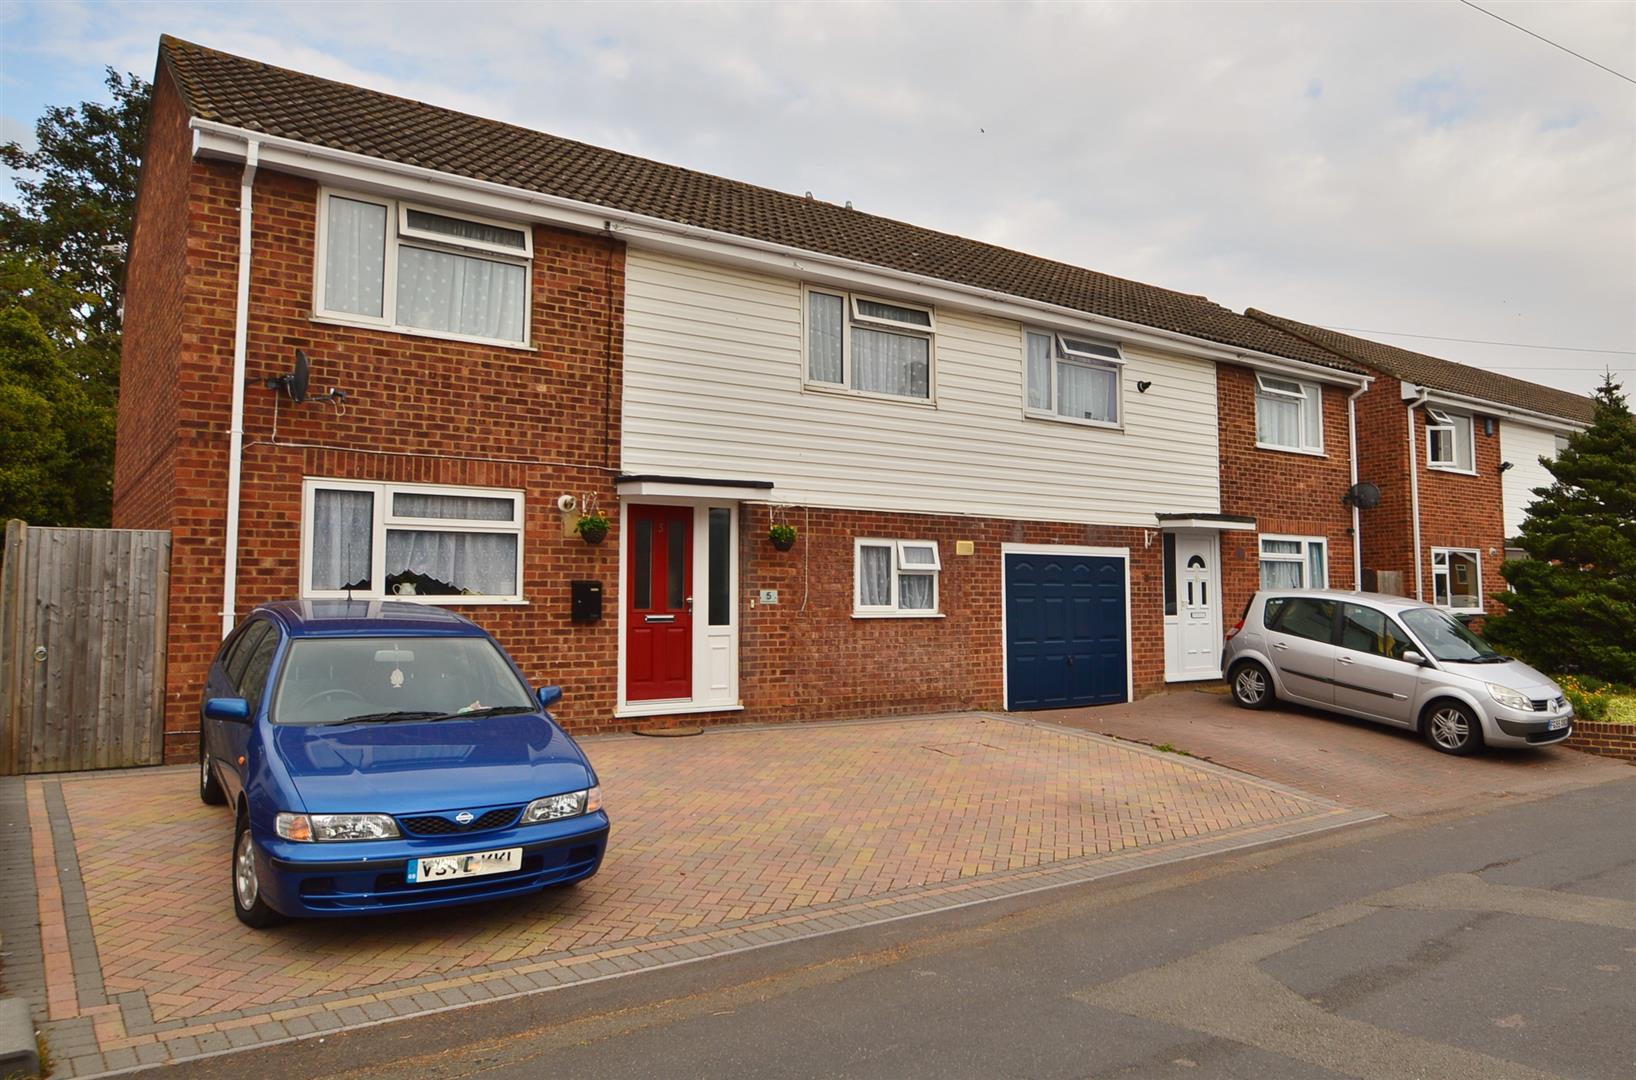 4 Bedrooms Semi Detached House for sale in Mackenders Lane, Eccles